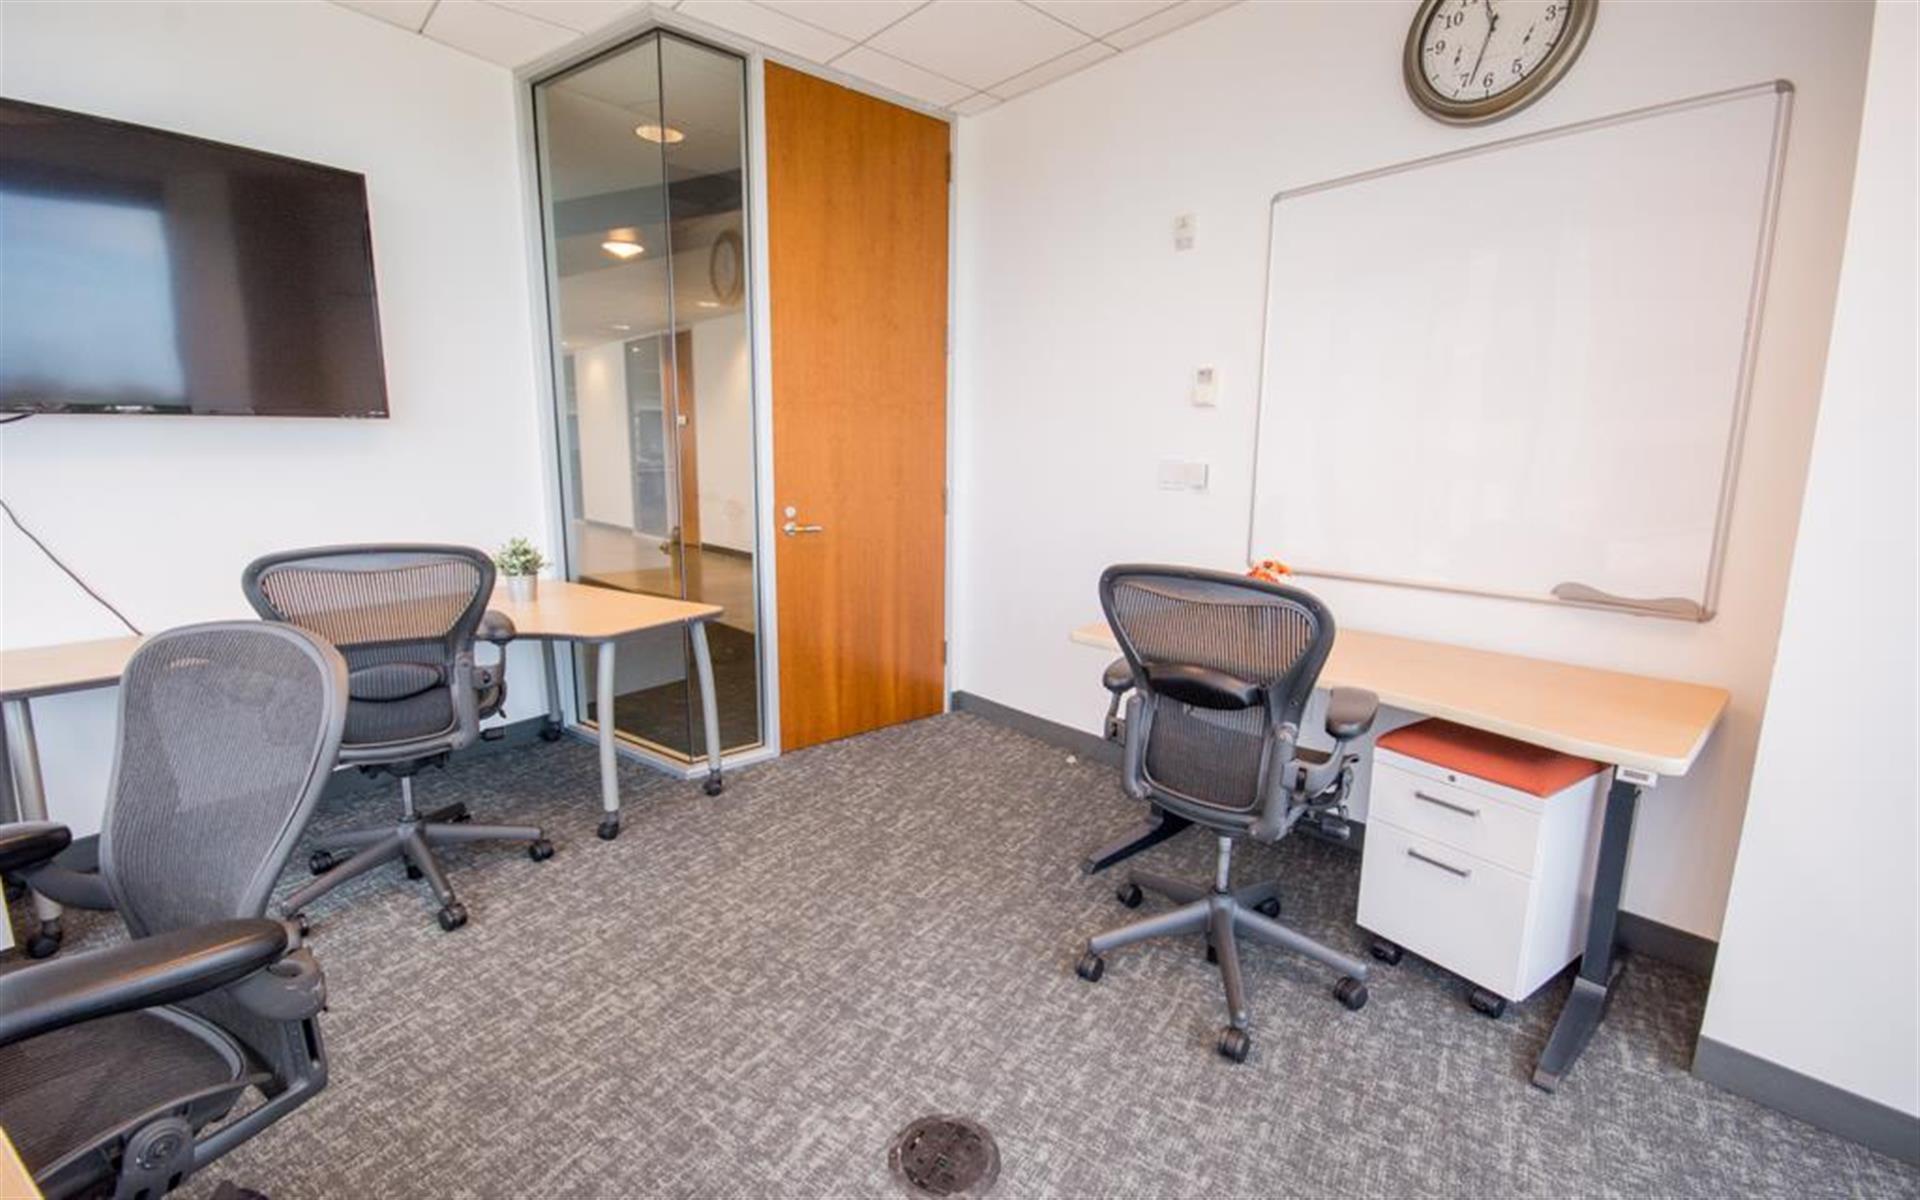 The Port Workspaces - City Center, Oakland